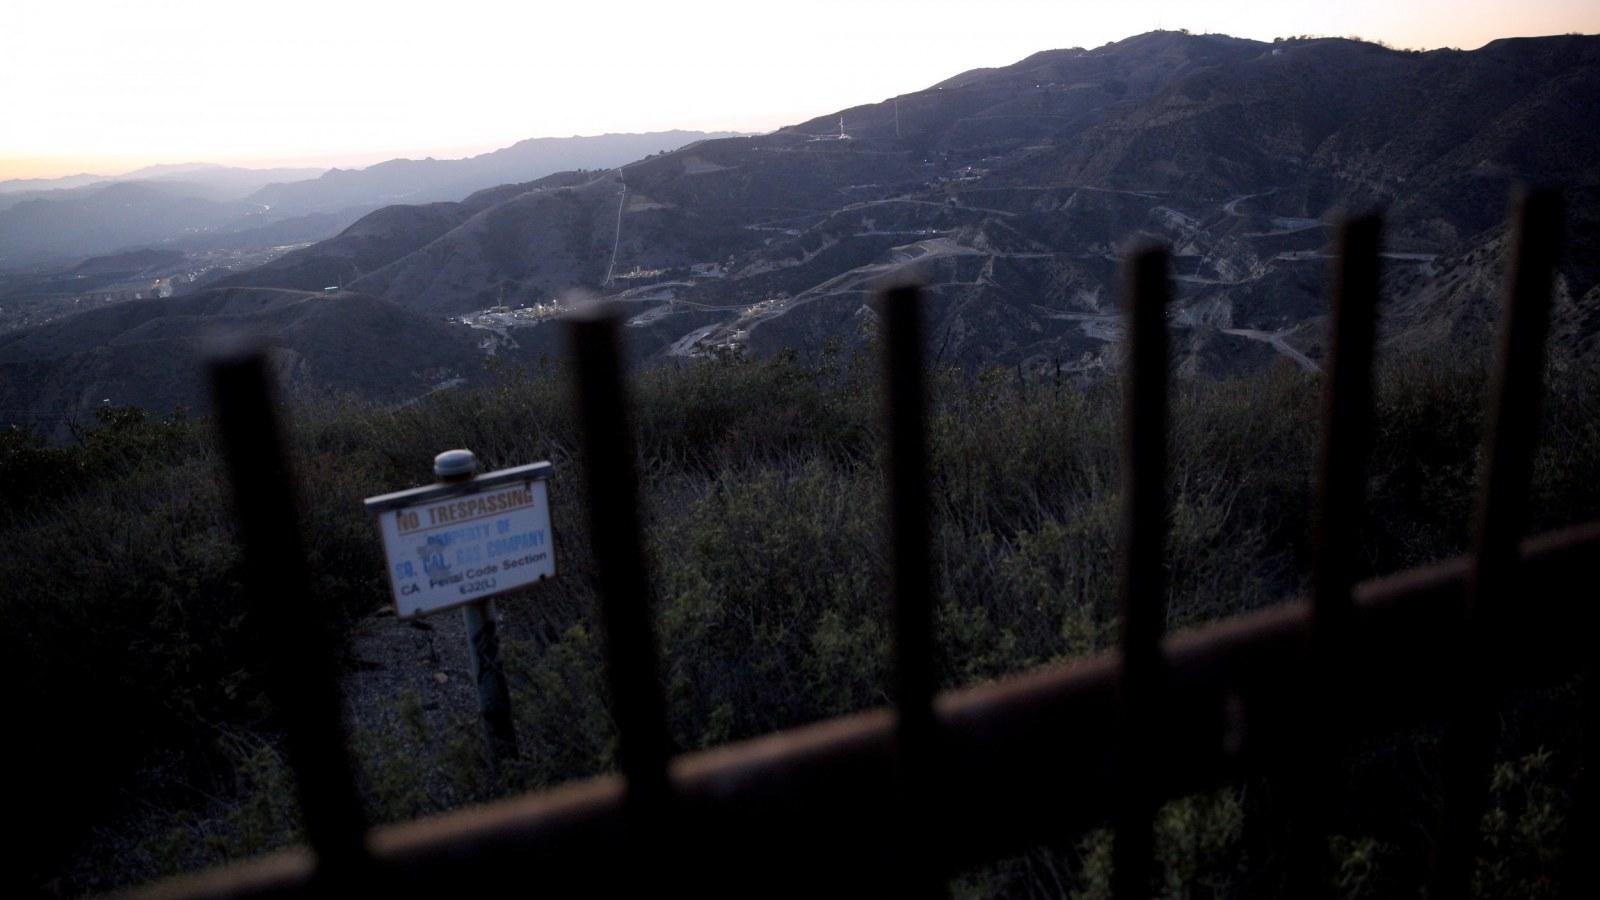 Methane Gas Crisis: How California's Porter Ranch Became a Ghost Town